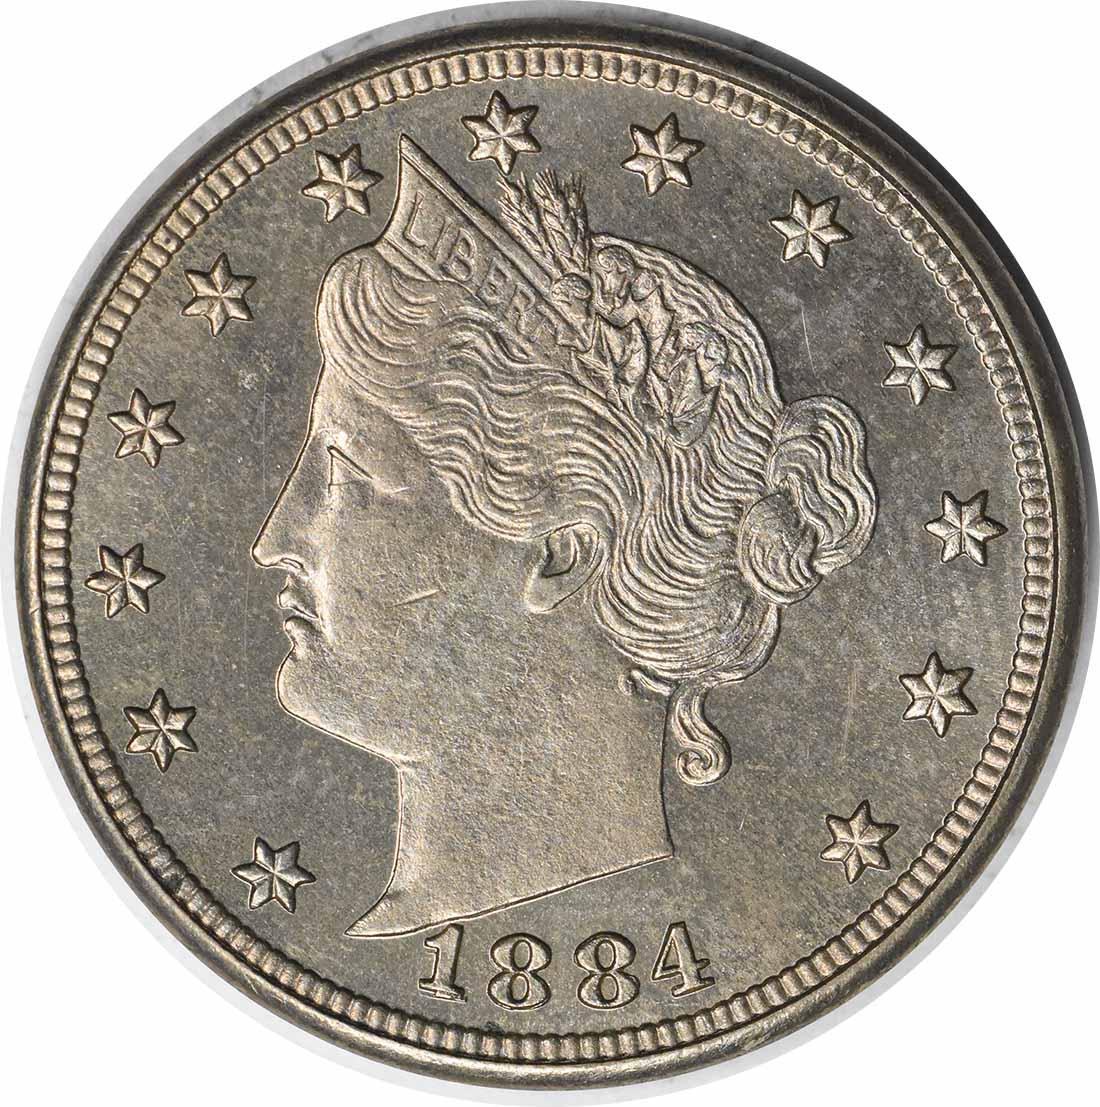 1884 Liberty Nickel RPD FS-301 Proof 64 Uncertified #209